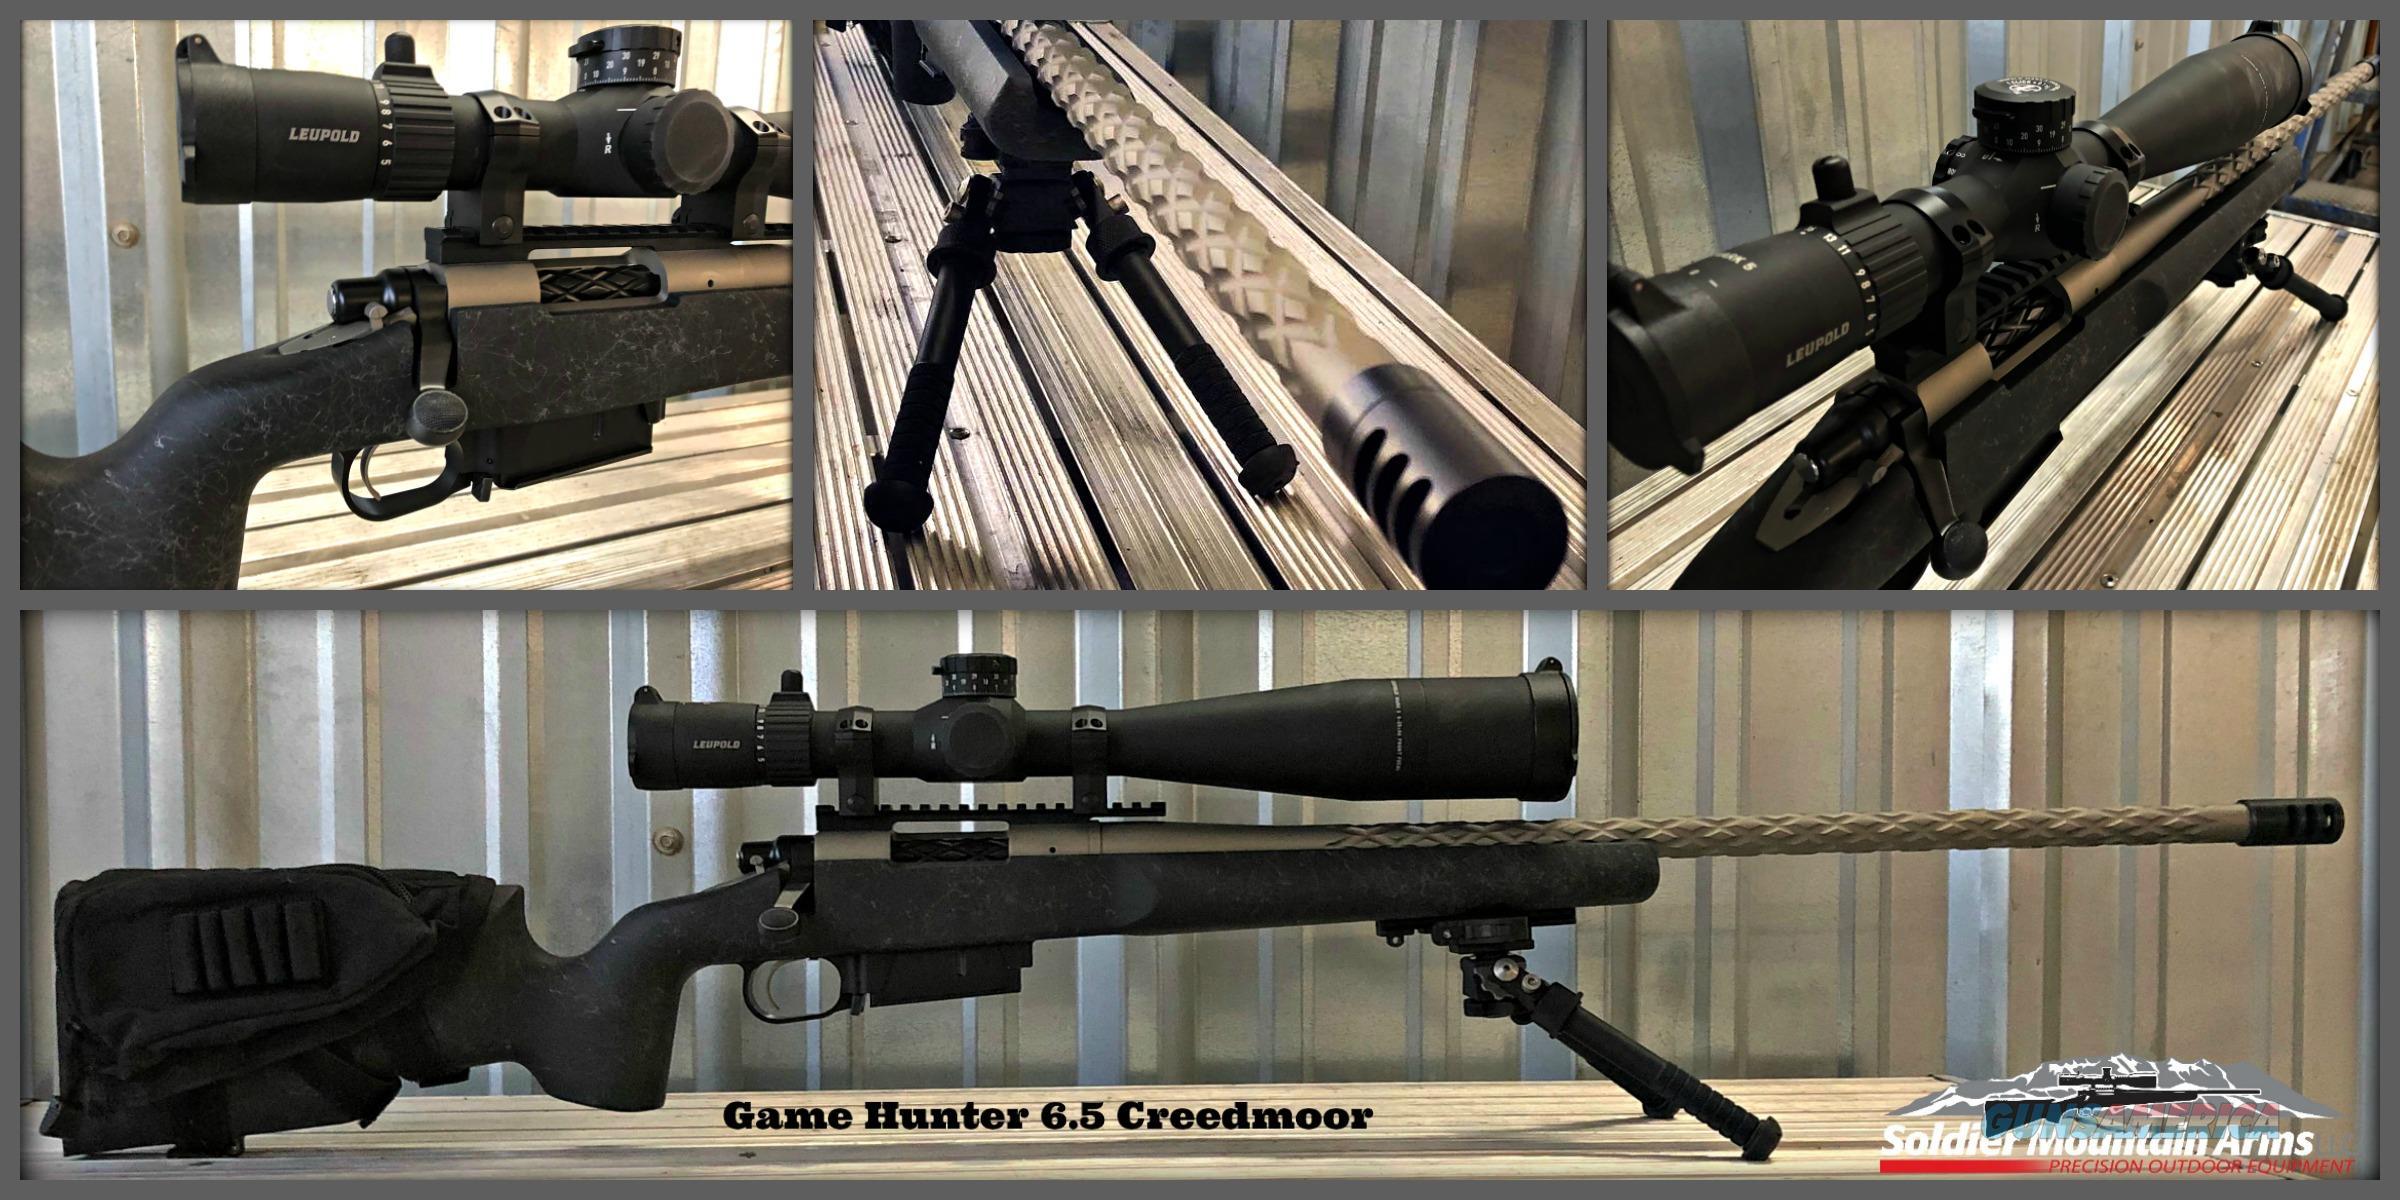 Soldier Mountain Arms LLC Game Hunter 6.5 Creedmoor Package  Guns > Rifles > Custom Rifles > Bolt Action